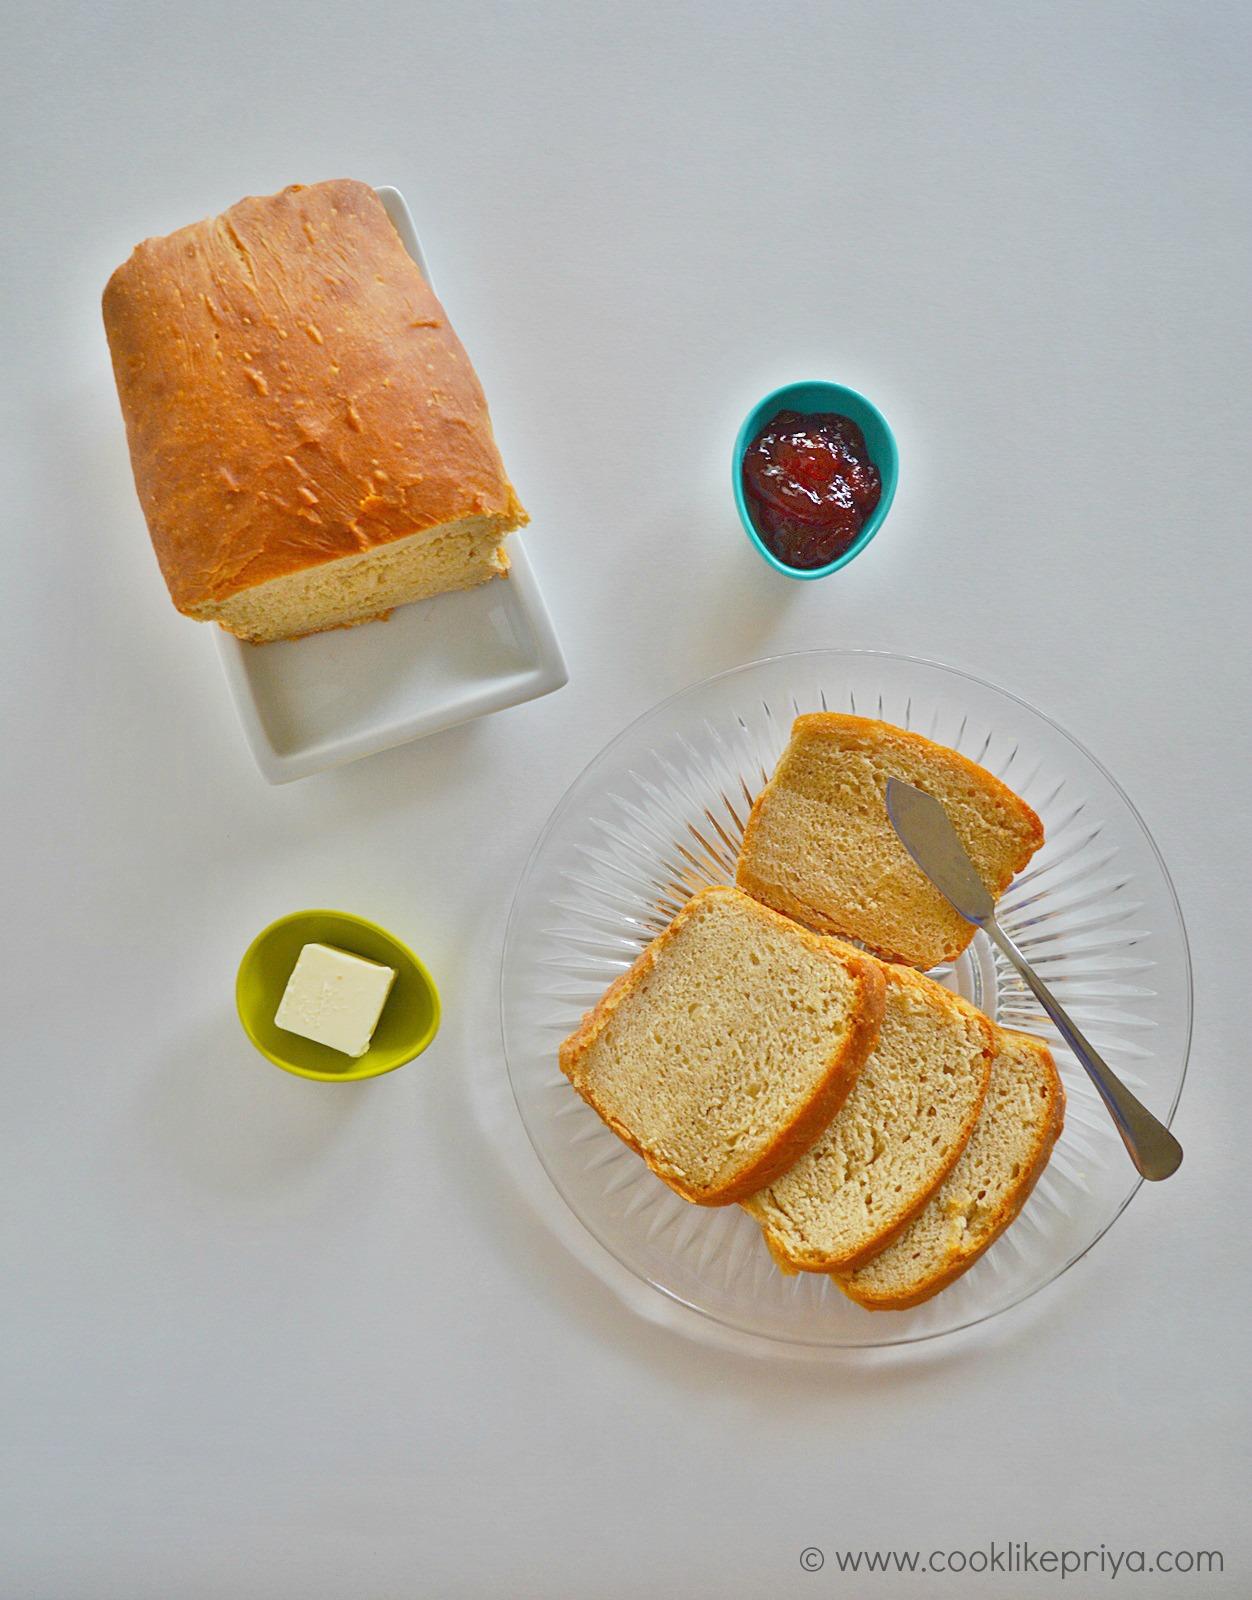 Soft homemade bread